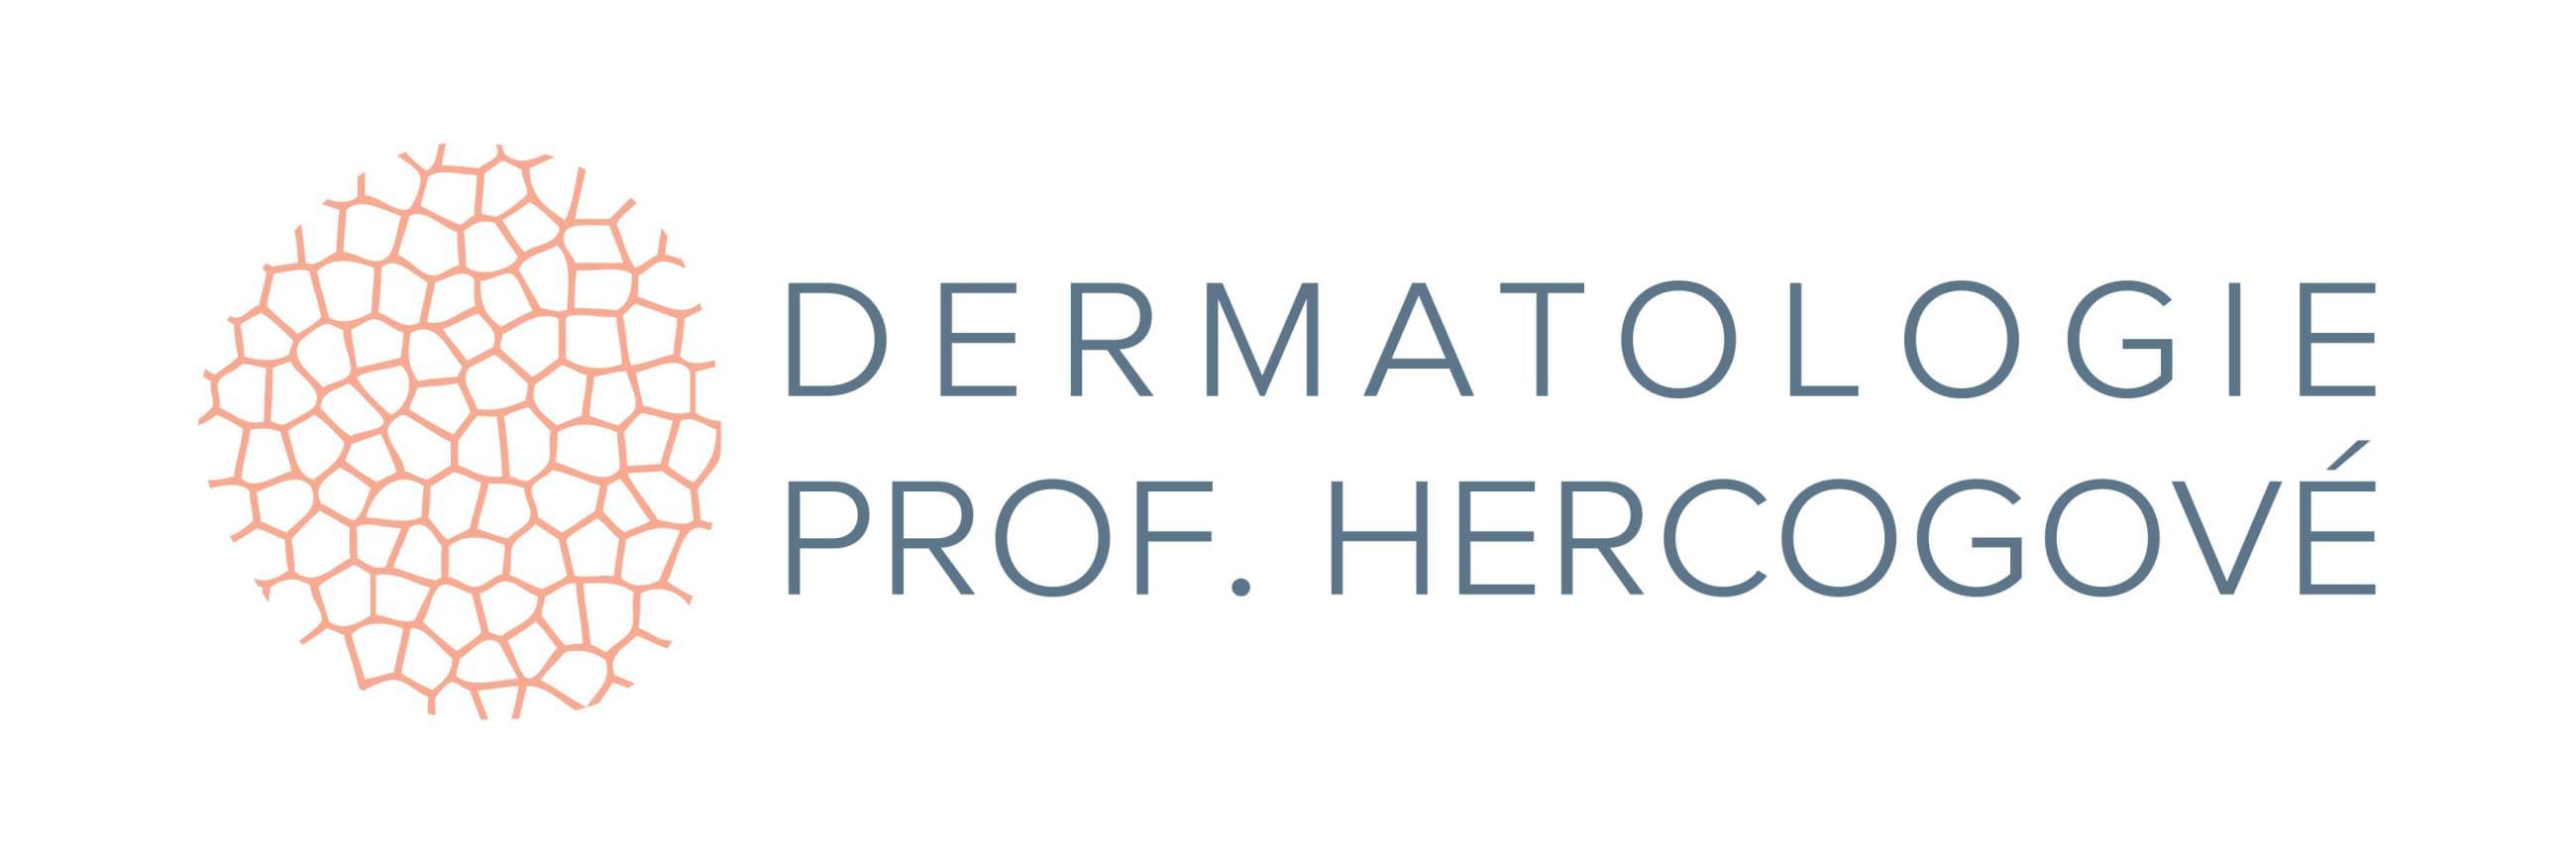 dermatologie-prof-hercogove-logo